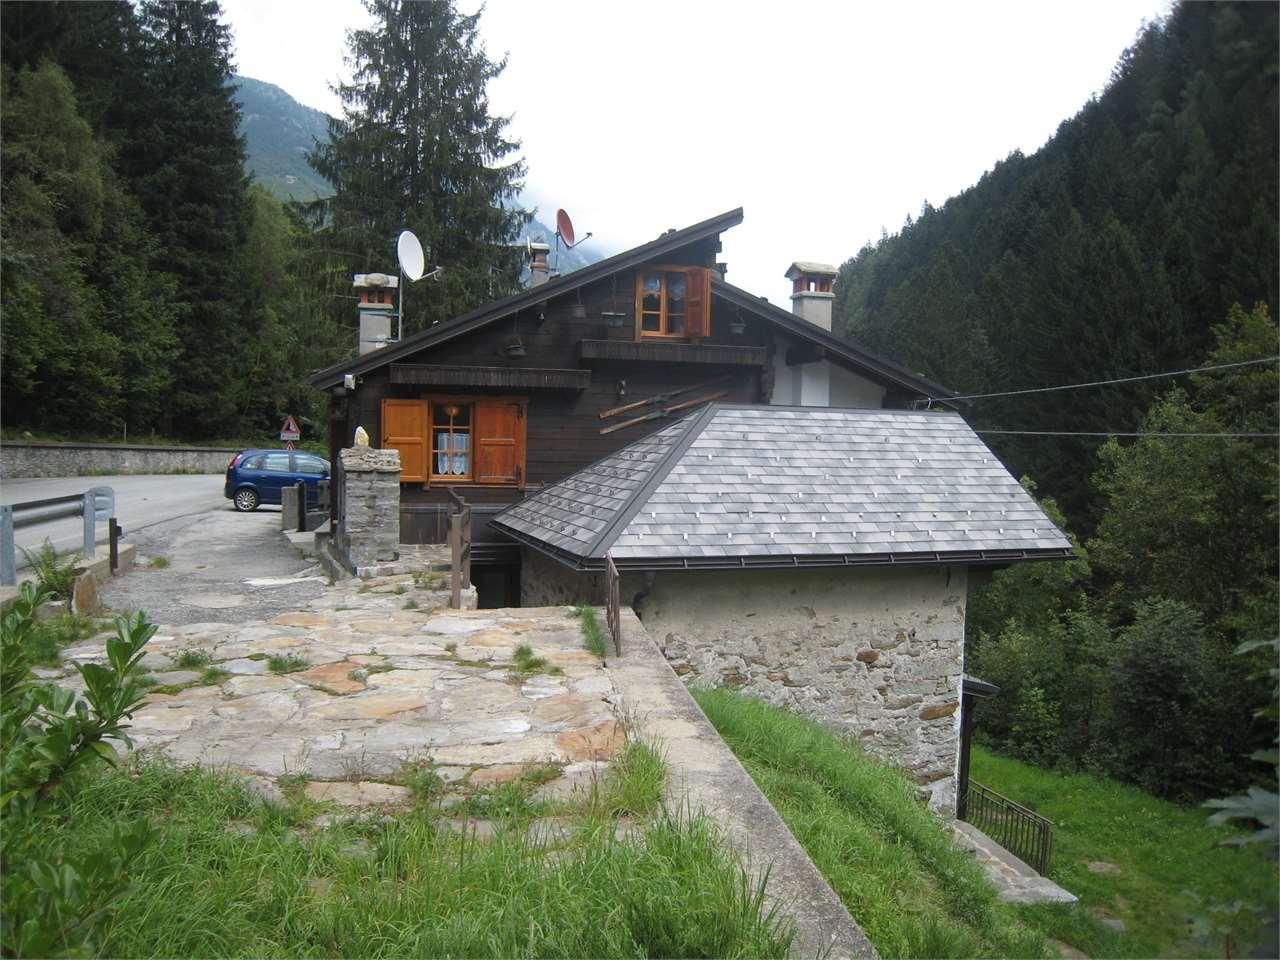 Vendita Casa Indipendente Casa/Villa Macugnaga strada statale 549 504 34760